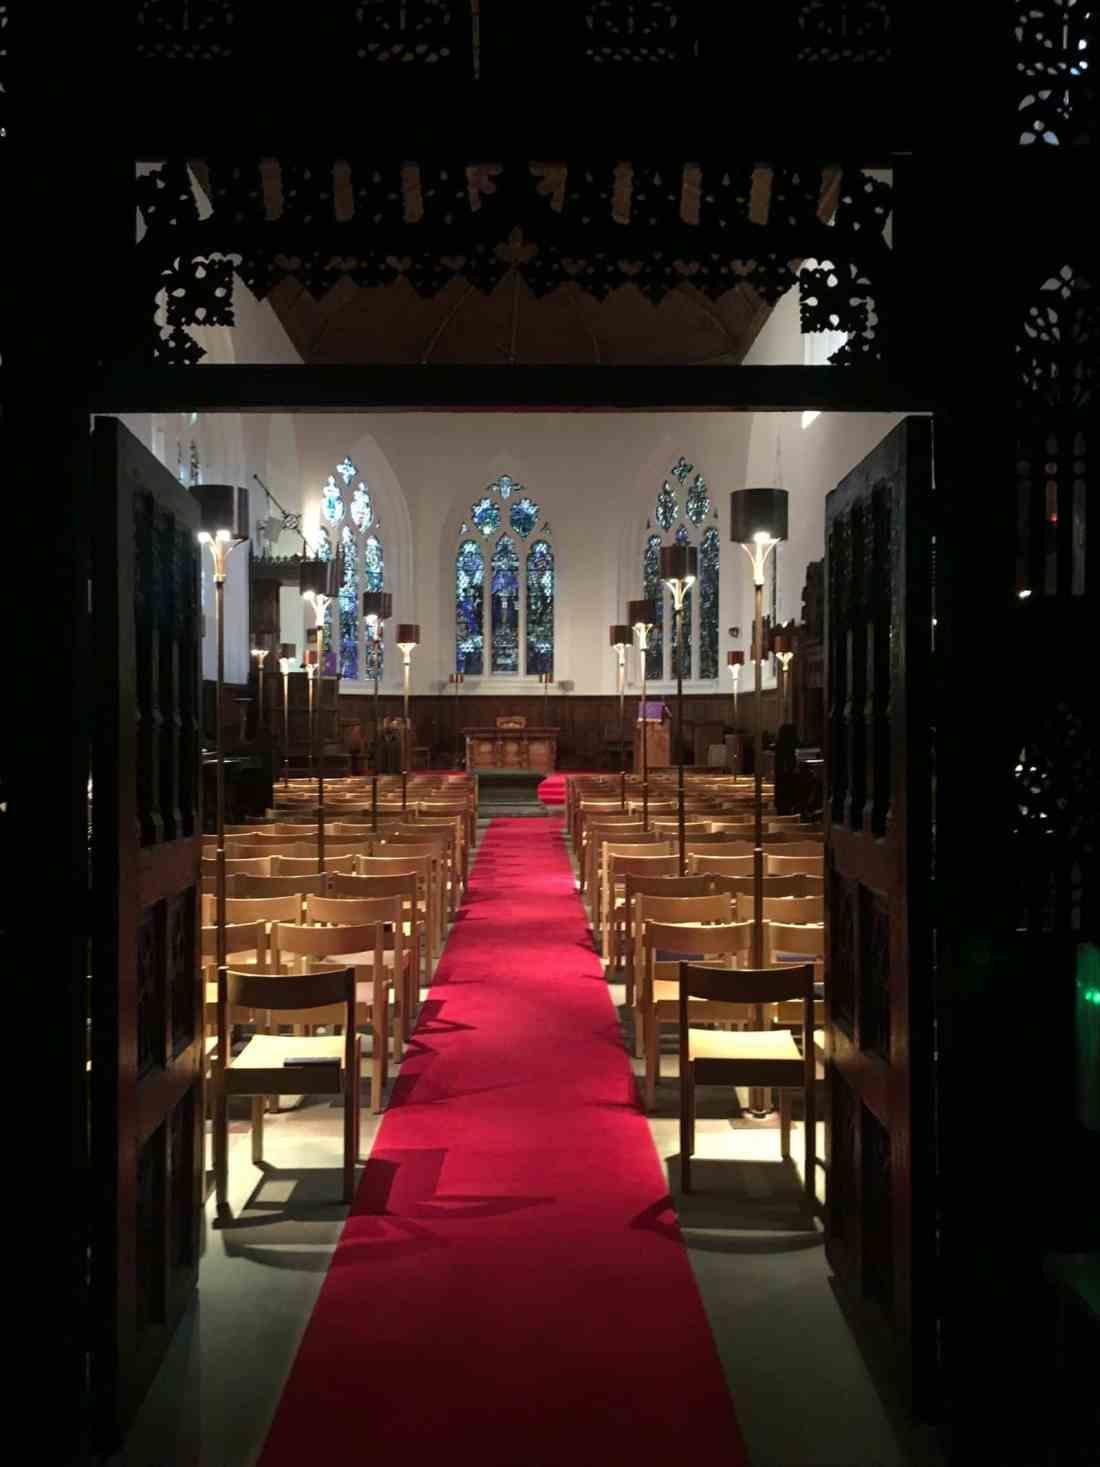 aberdeen king's college chapel